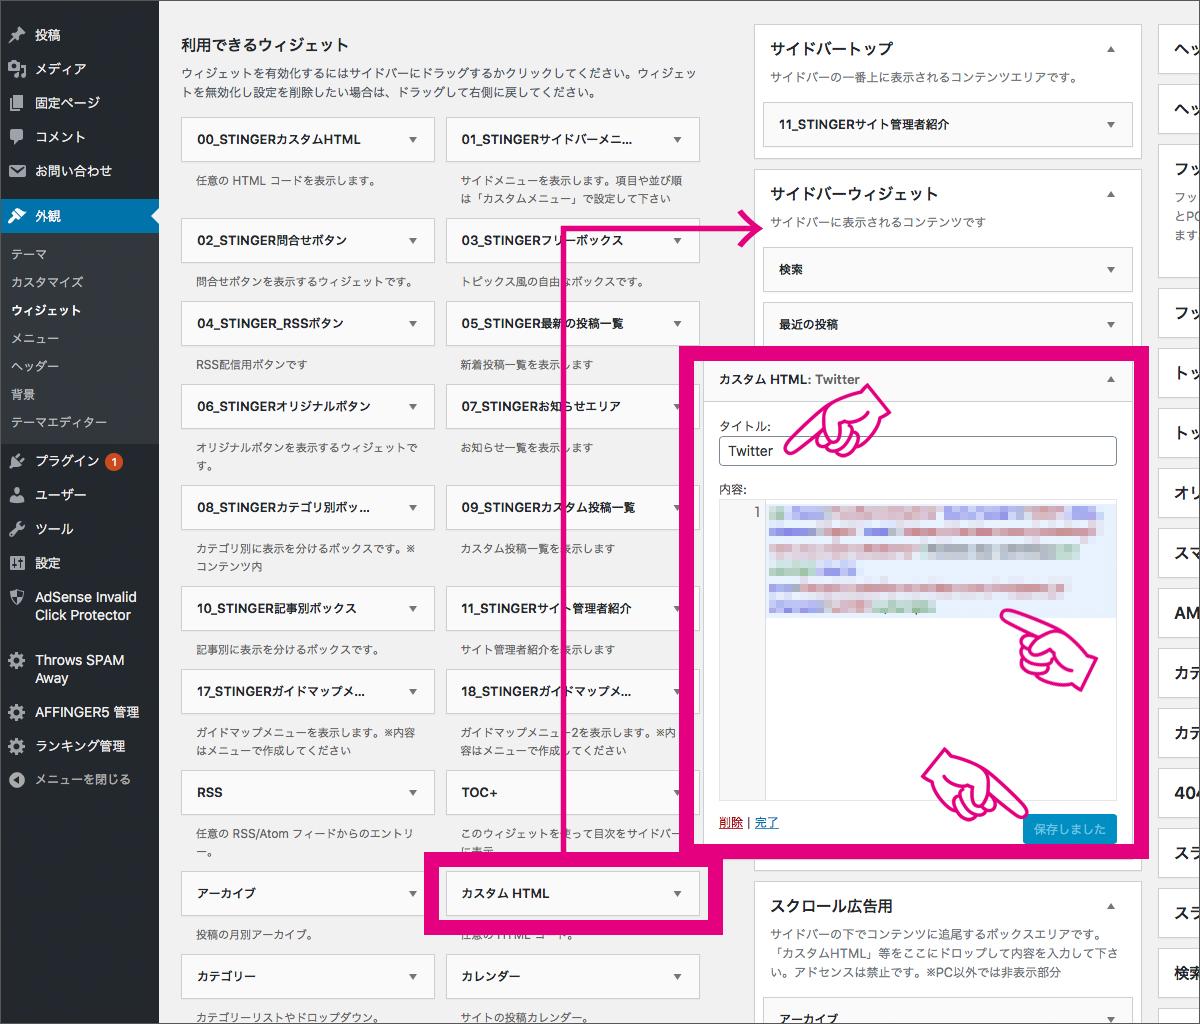 2. AFFINGER5の「Twitter」埋め込み方法【ワードプレスブログと連携】_8